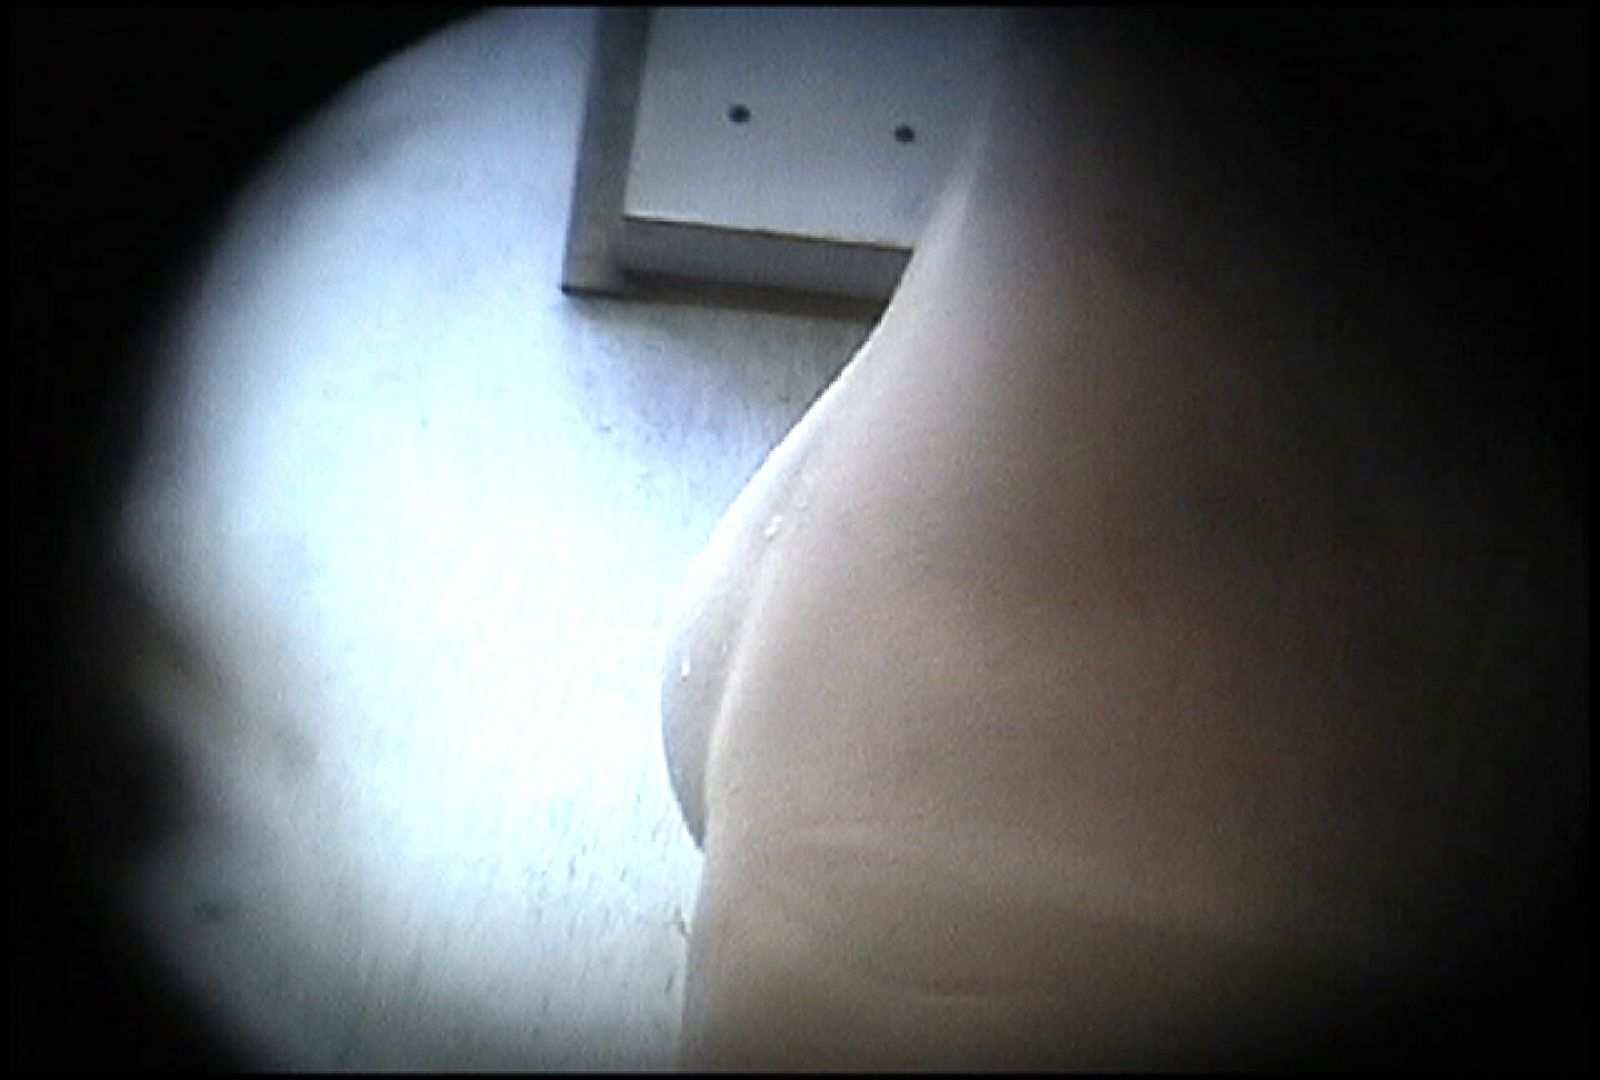 No.136 ギャル抜けきらないお女市さんのタレたオッパイ シャワー中 | 乙女達のヌード  53連発 16